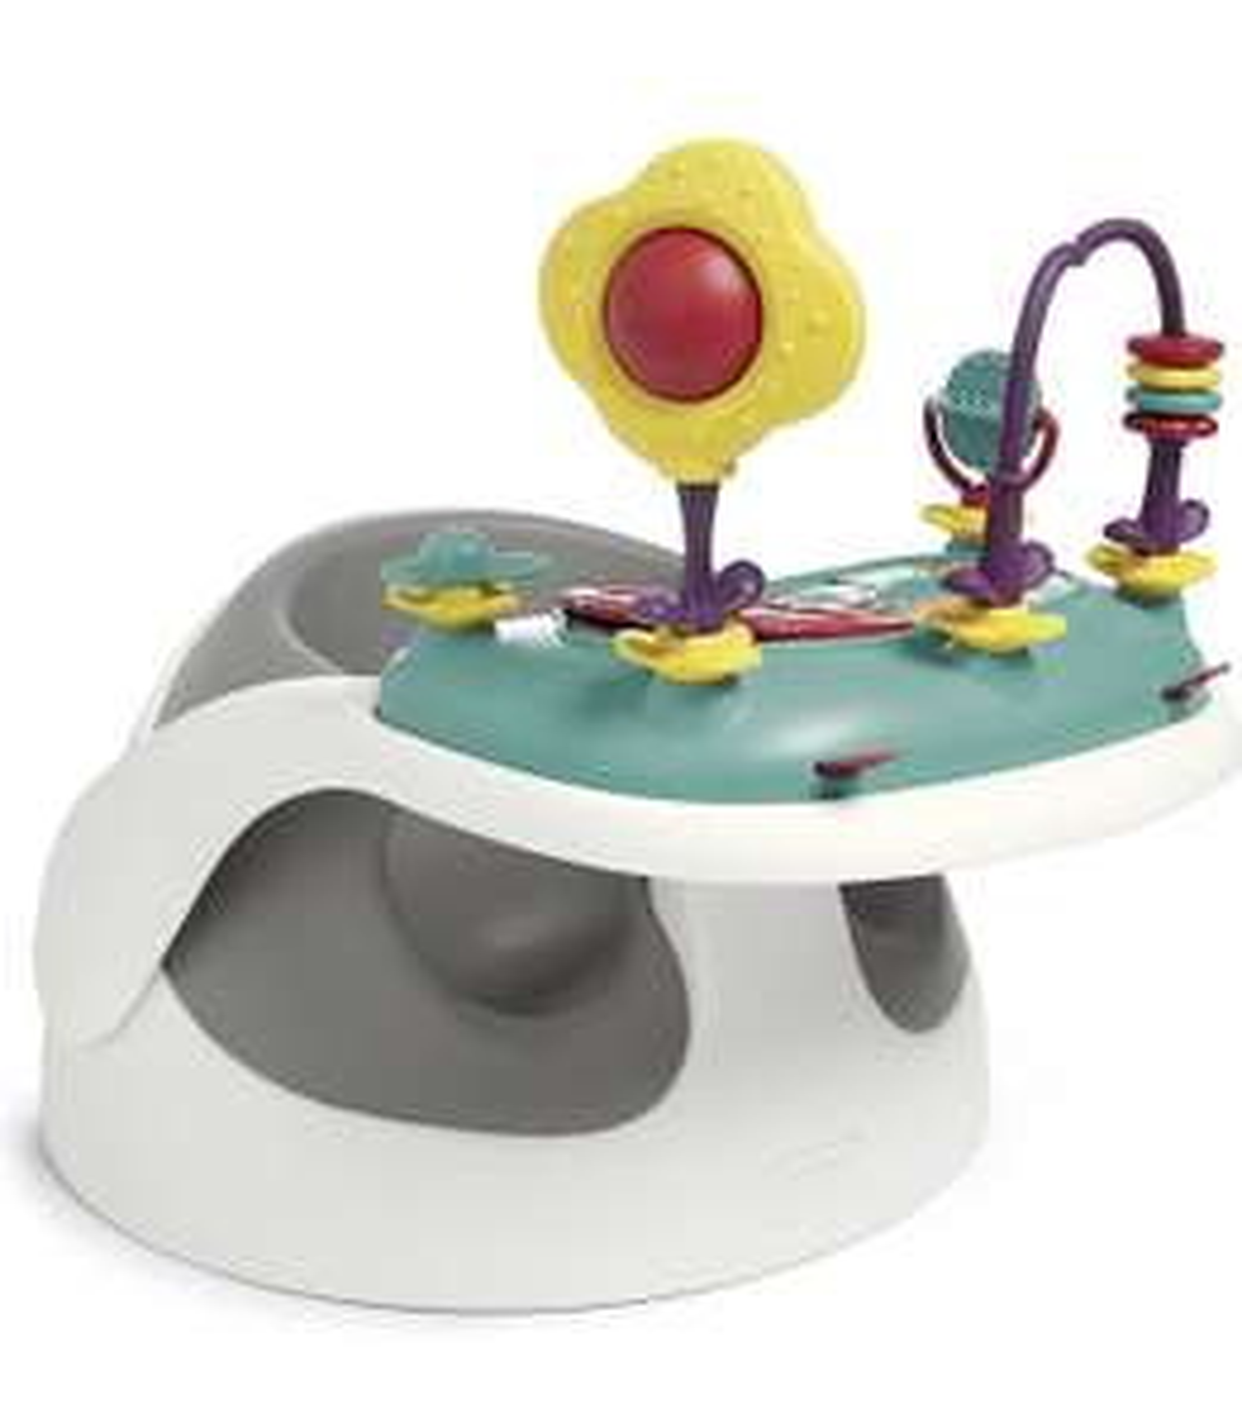 Mamas & Papas Baby Snug Seat and Activity Tray £39.95 at Amazon